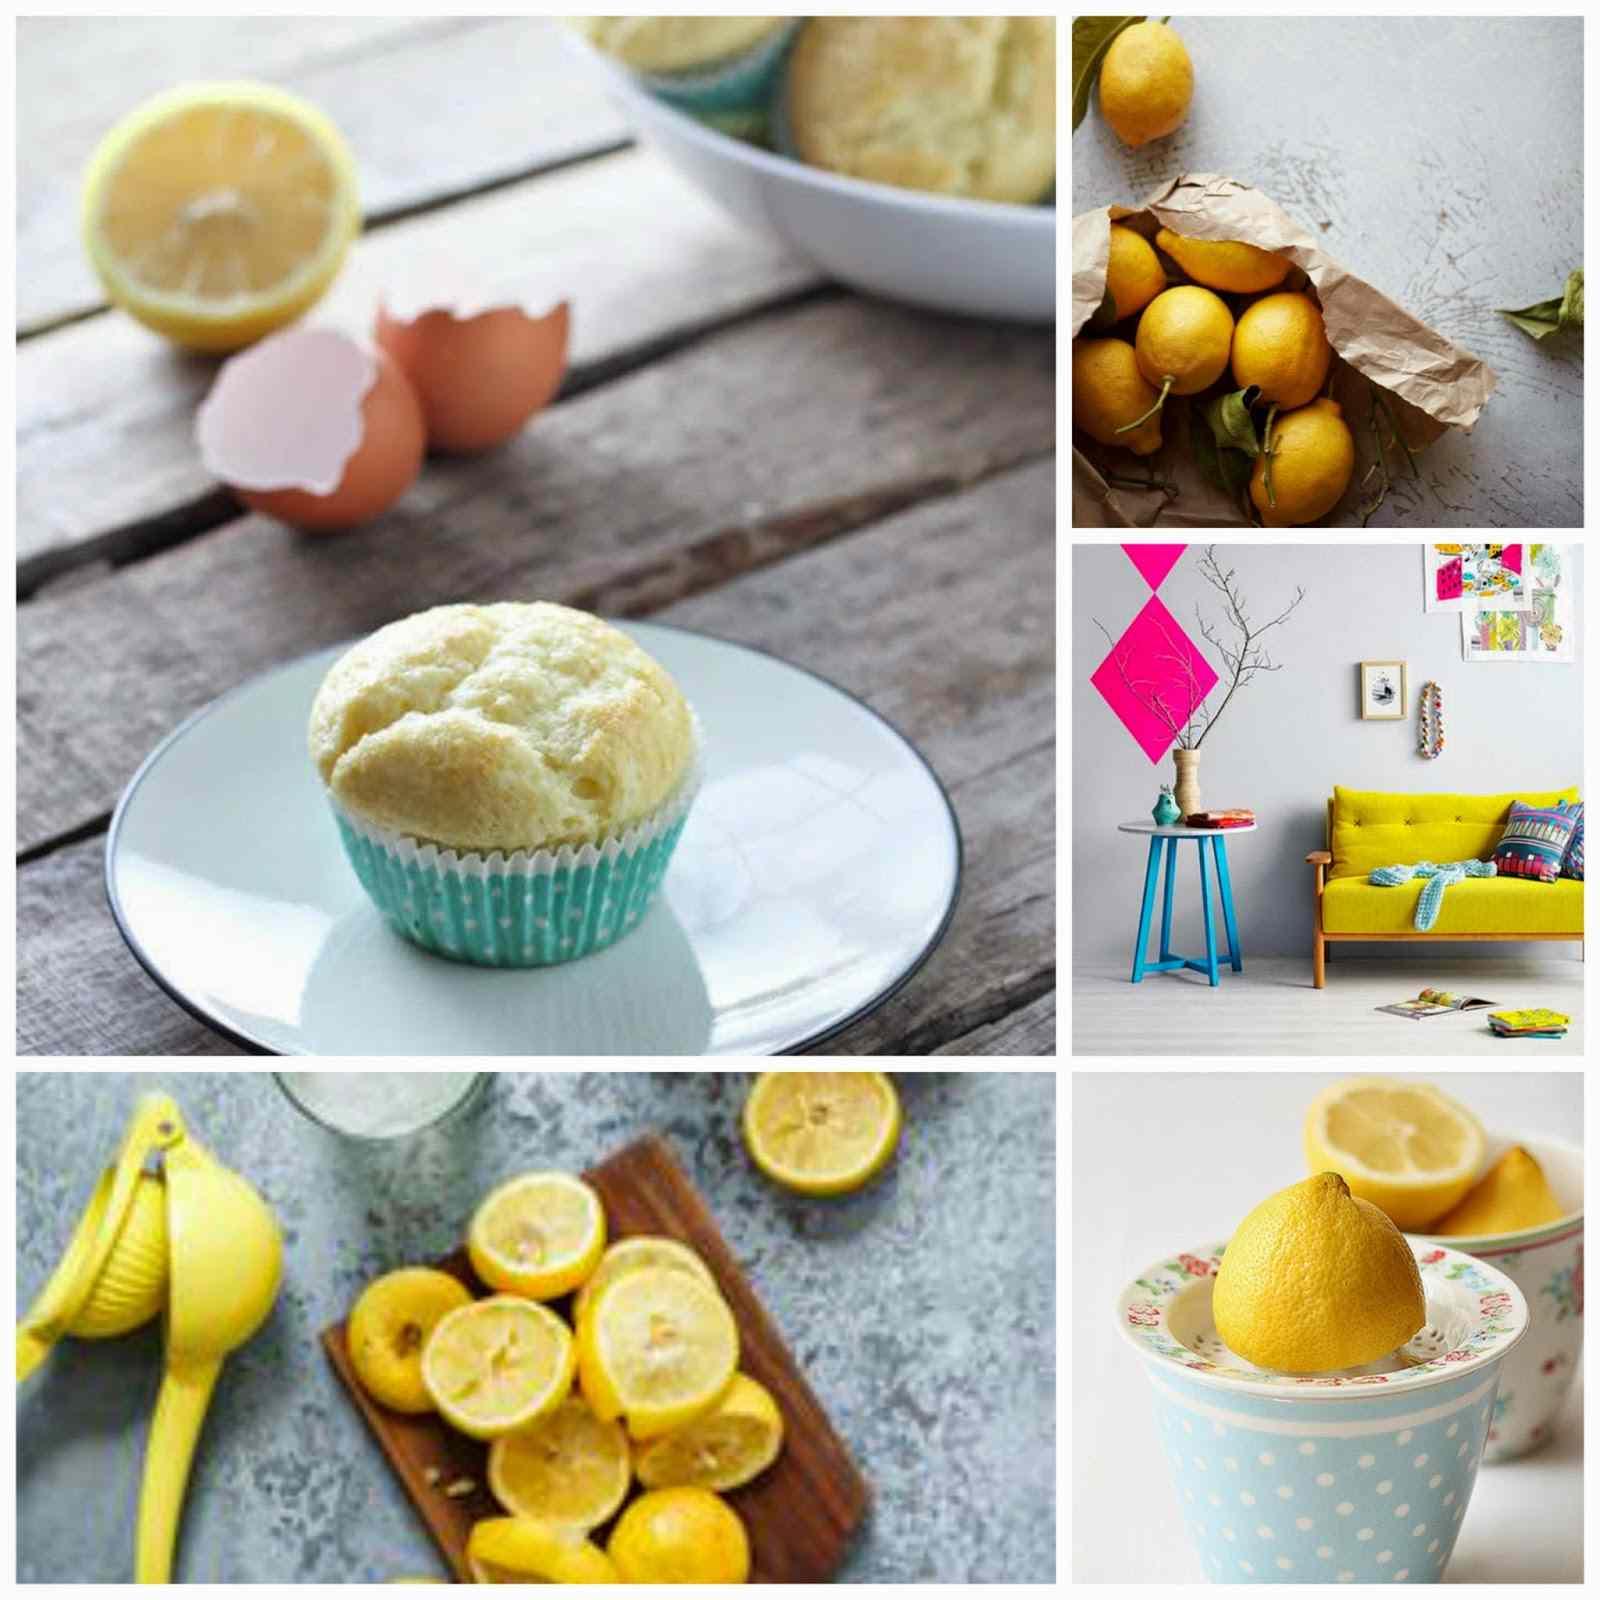 Ricetta: Lemon muffins recipe / Muffins al limone